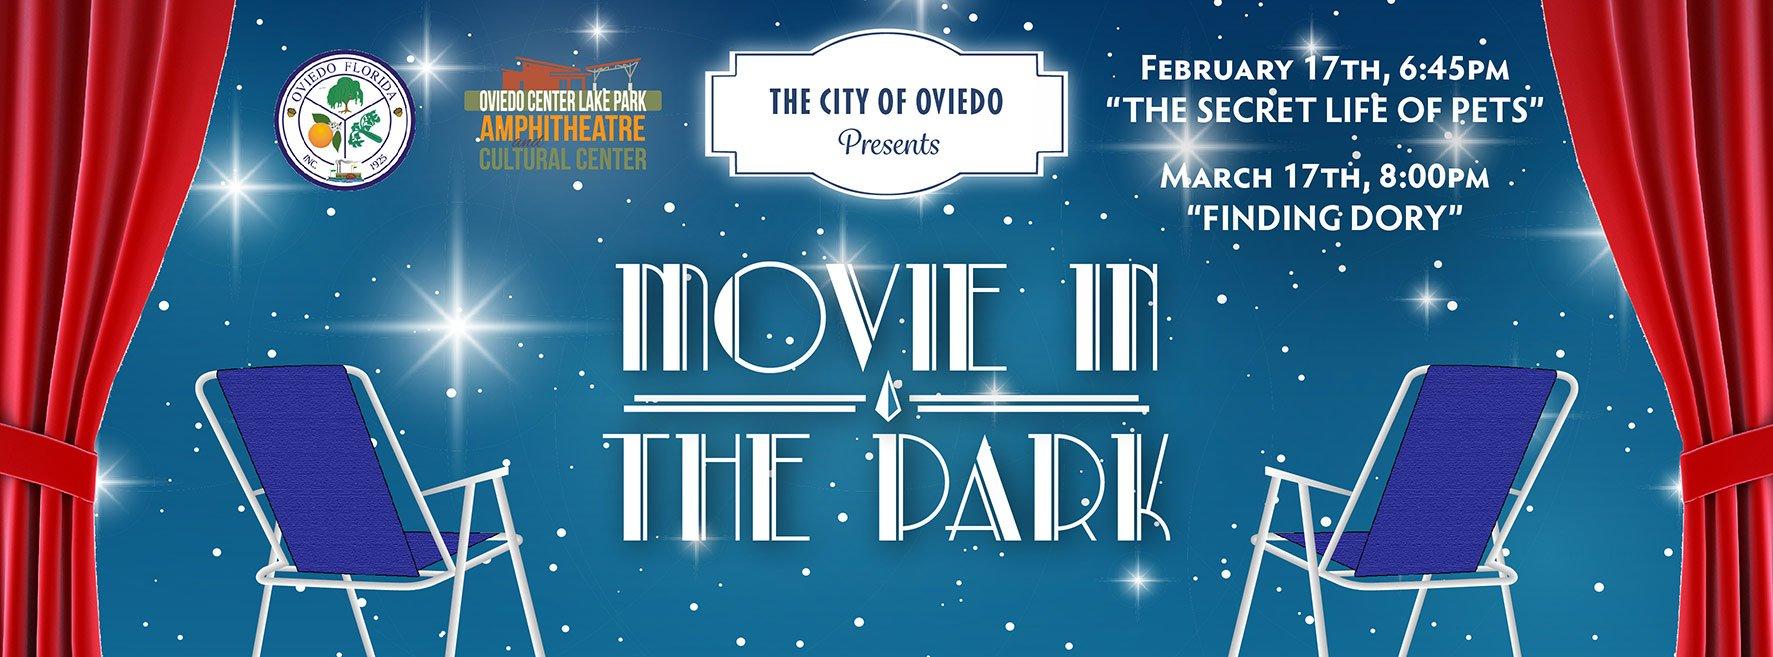 Movie-in-the-Park-2017-FB-Header